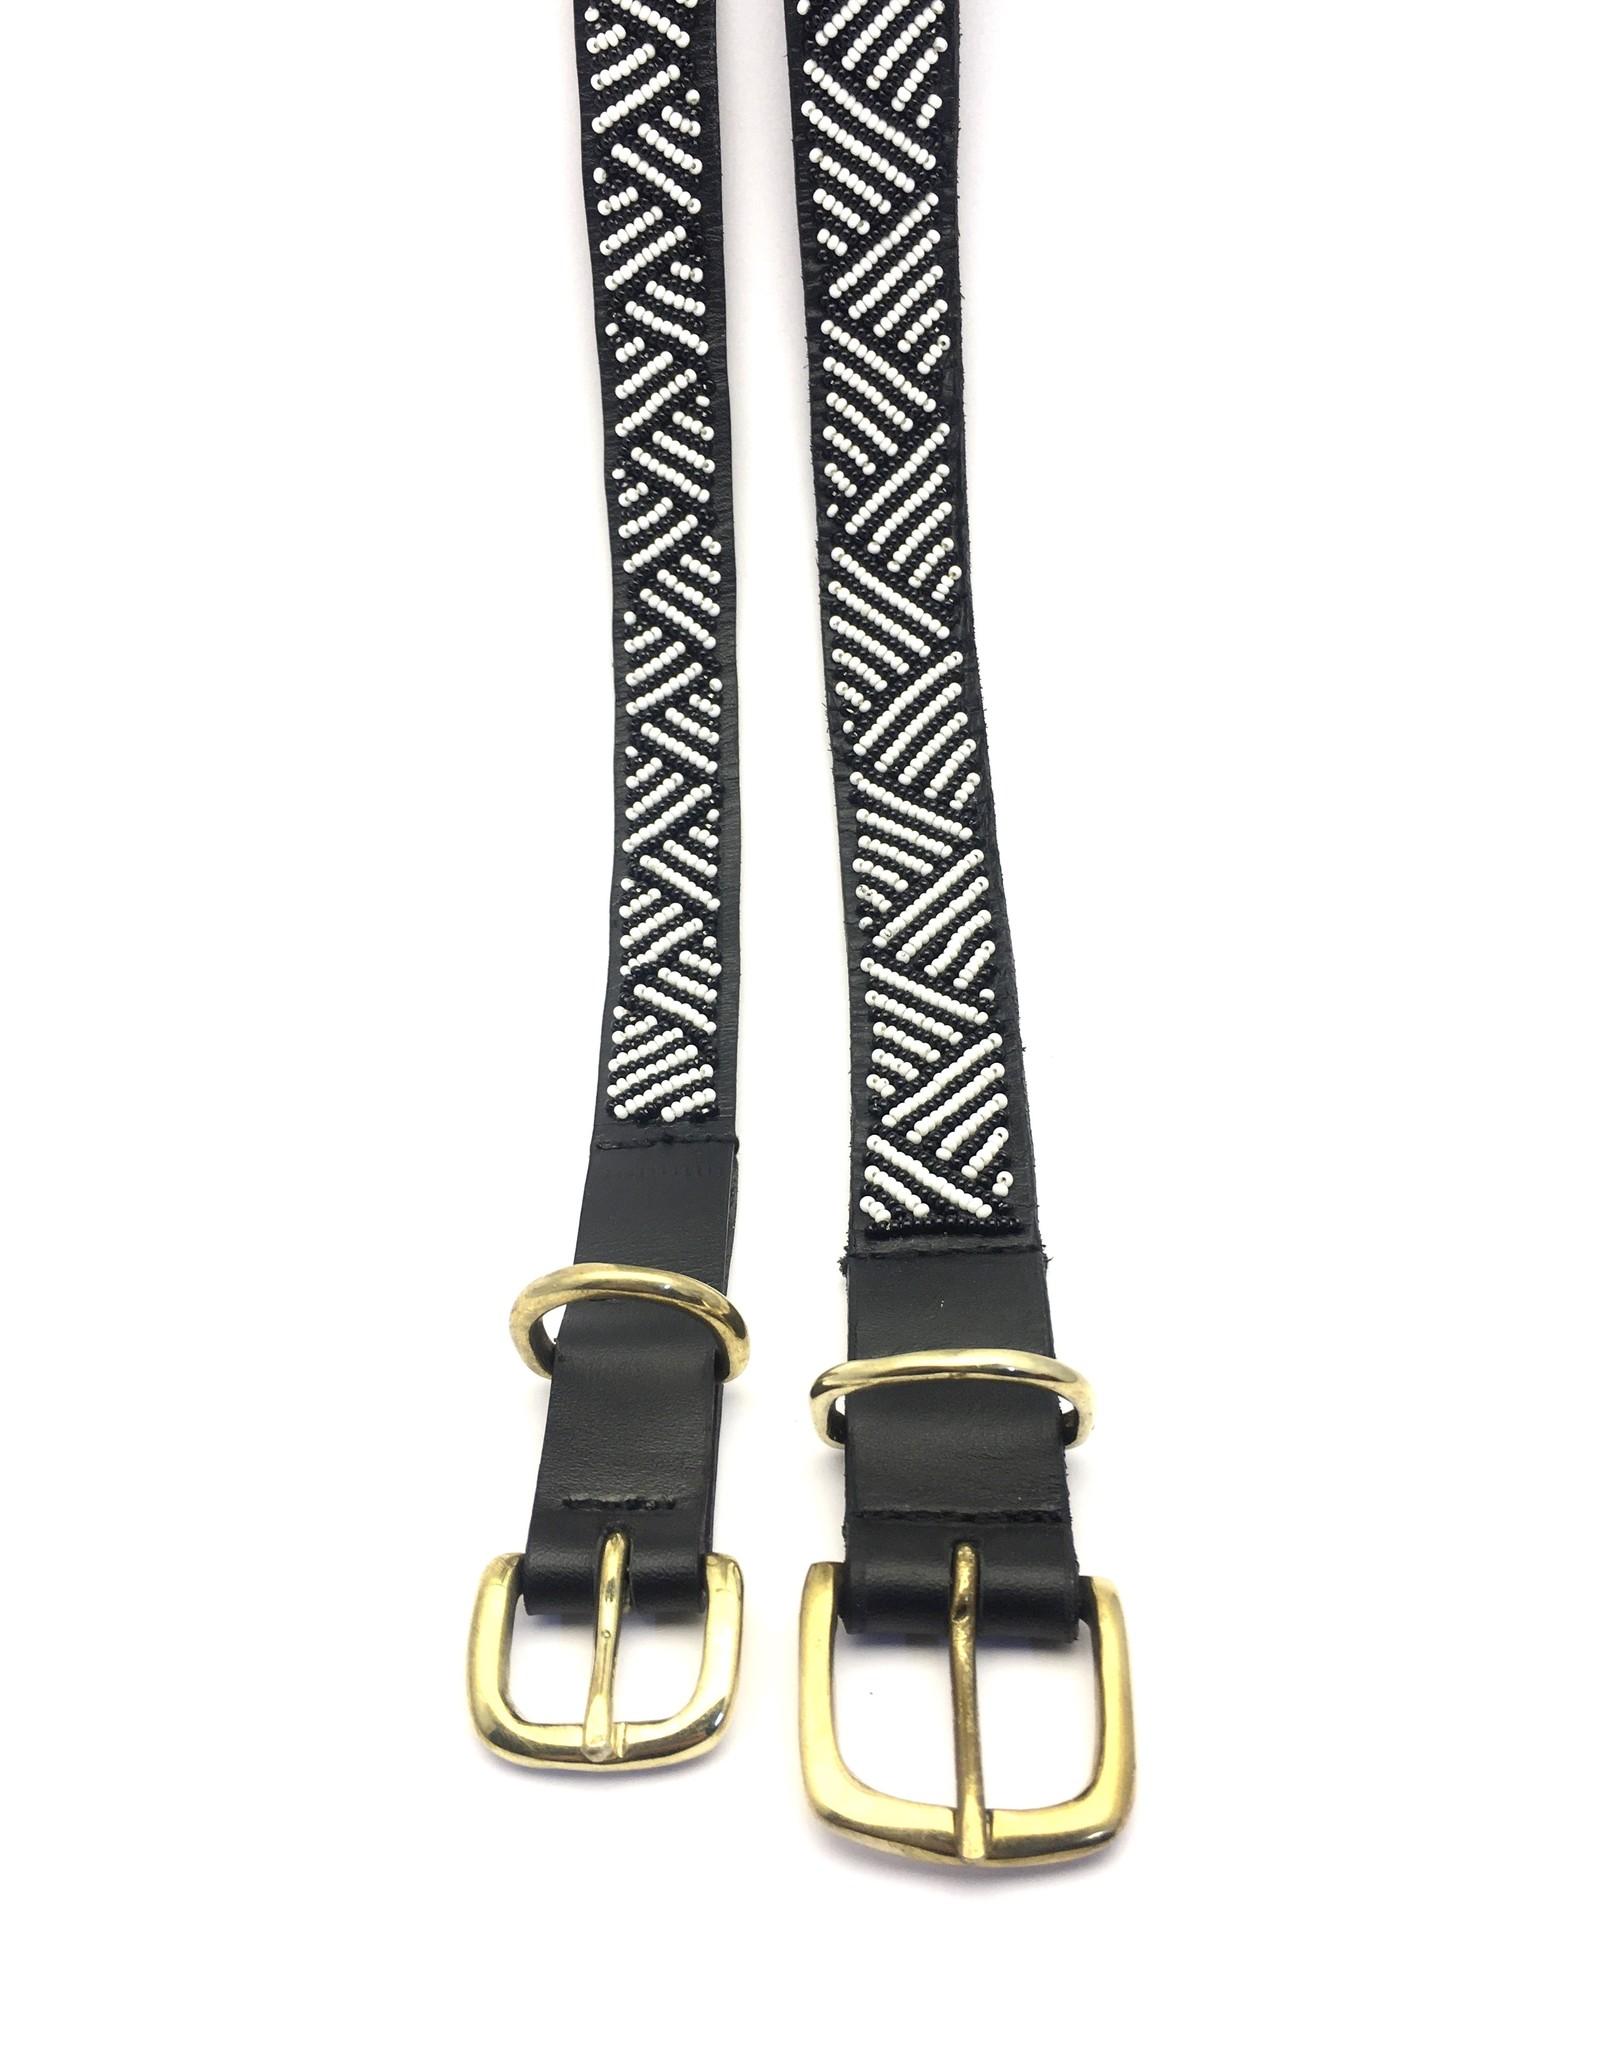 Maisha.Style Dog collar Elisa - black leather Maasai collar with black and white beads